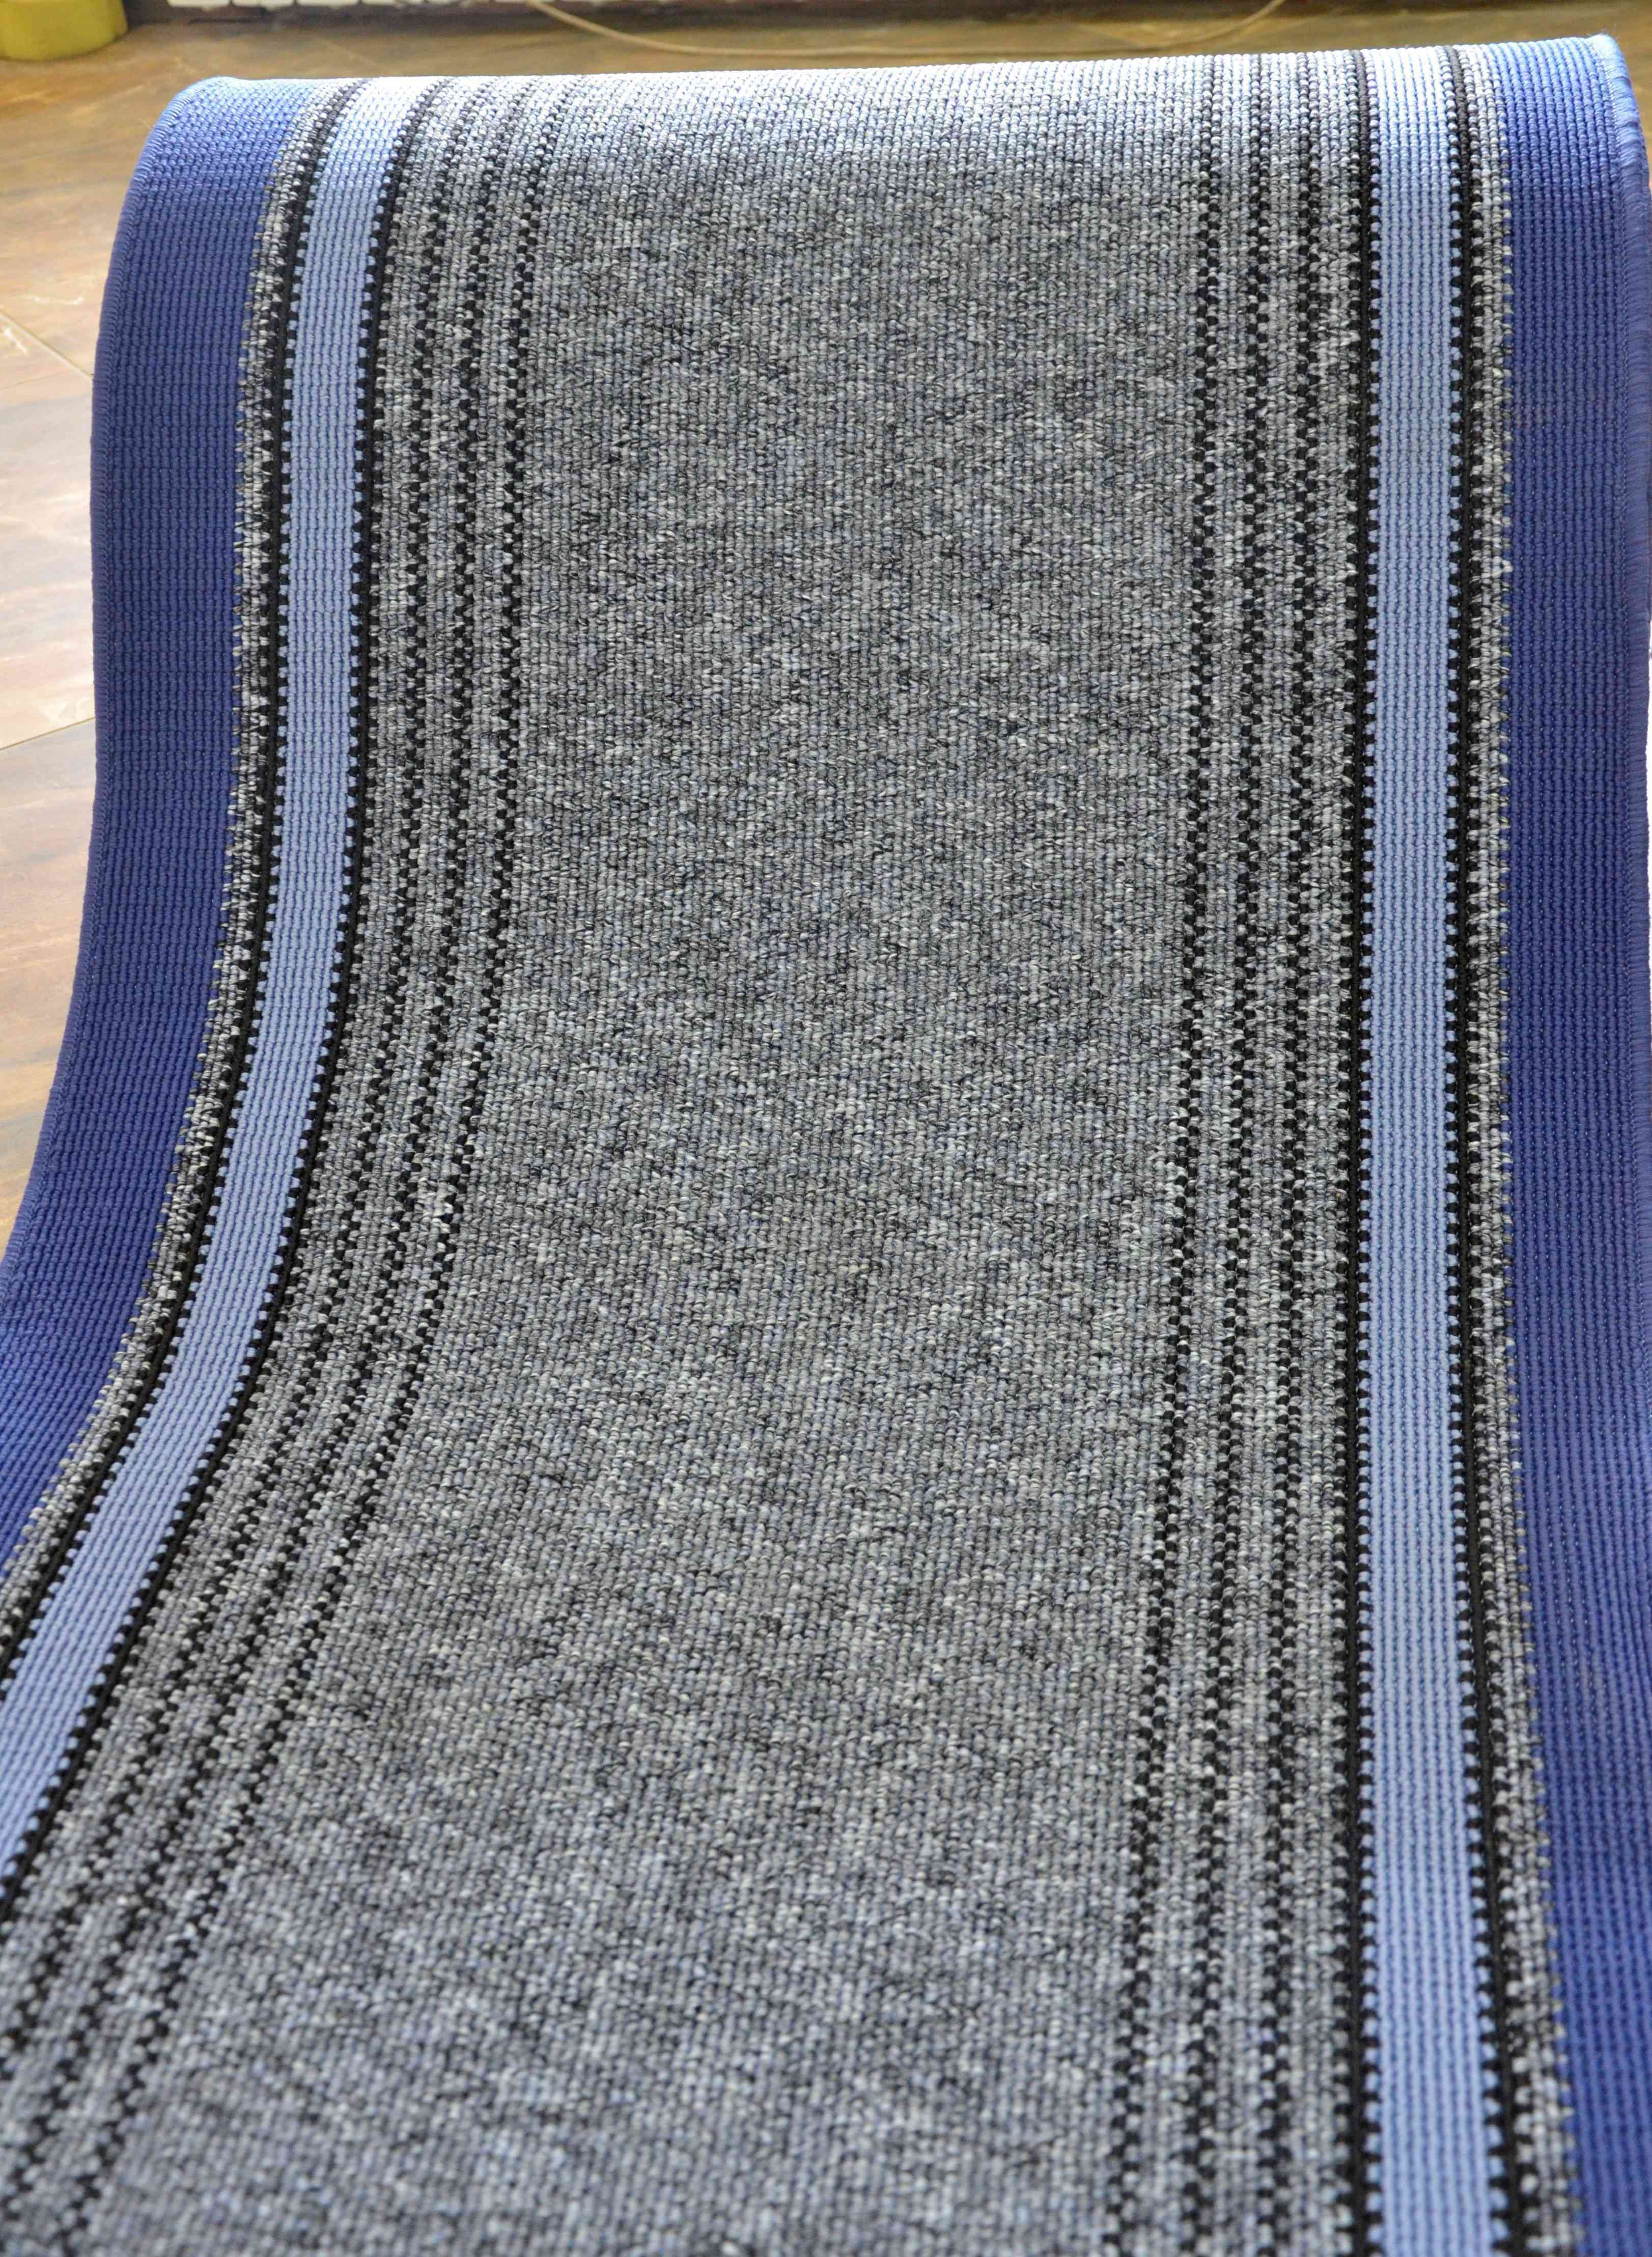 Traversa Covor, Saba 08, Albastru, 100x700 cm, 1350 gr/mp, 1x7 m 4